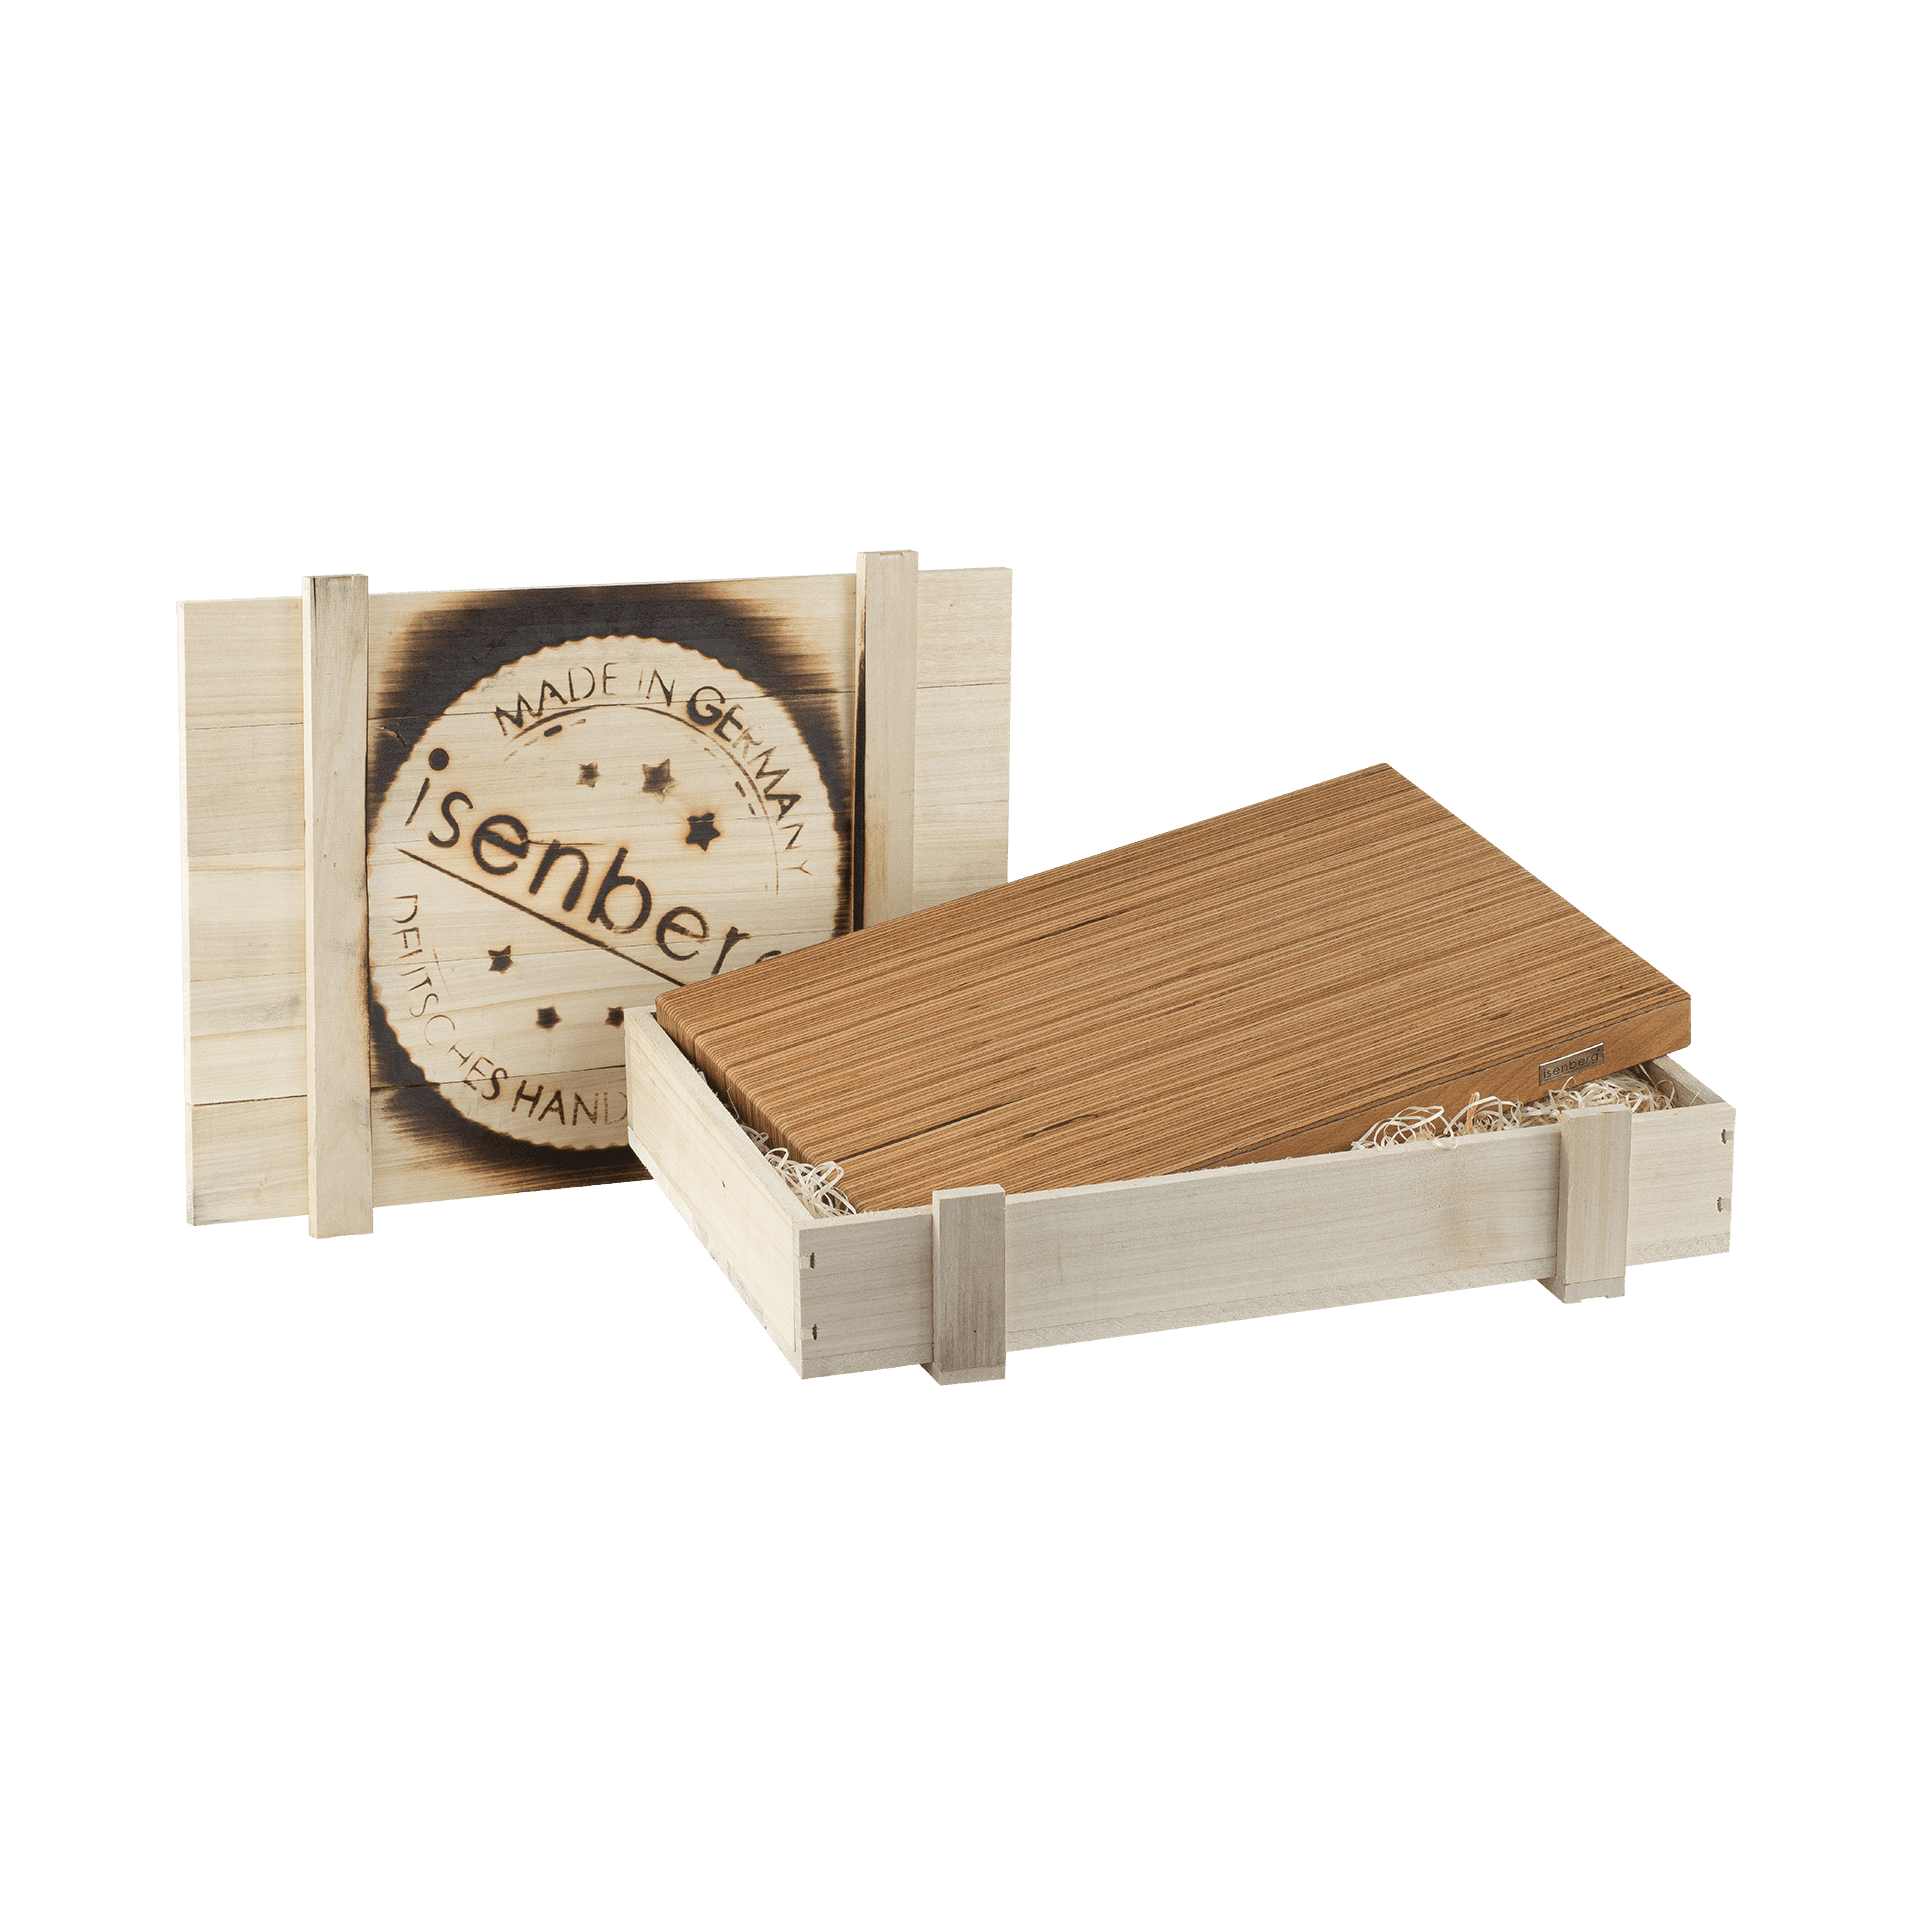 Isenberg Profi Schneidebrett Typ 1 Baubuche in Kiste